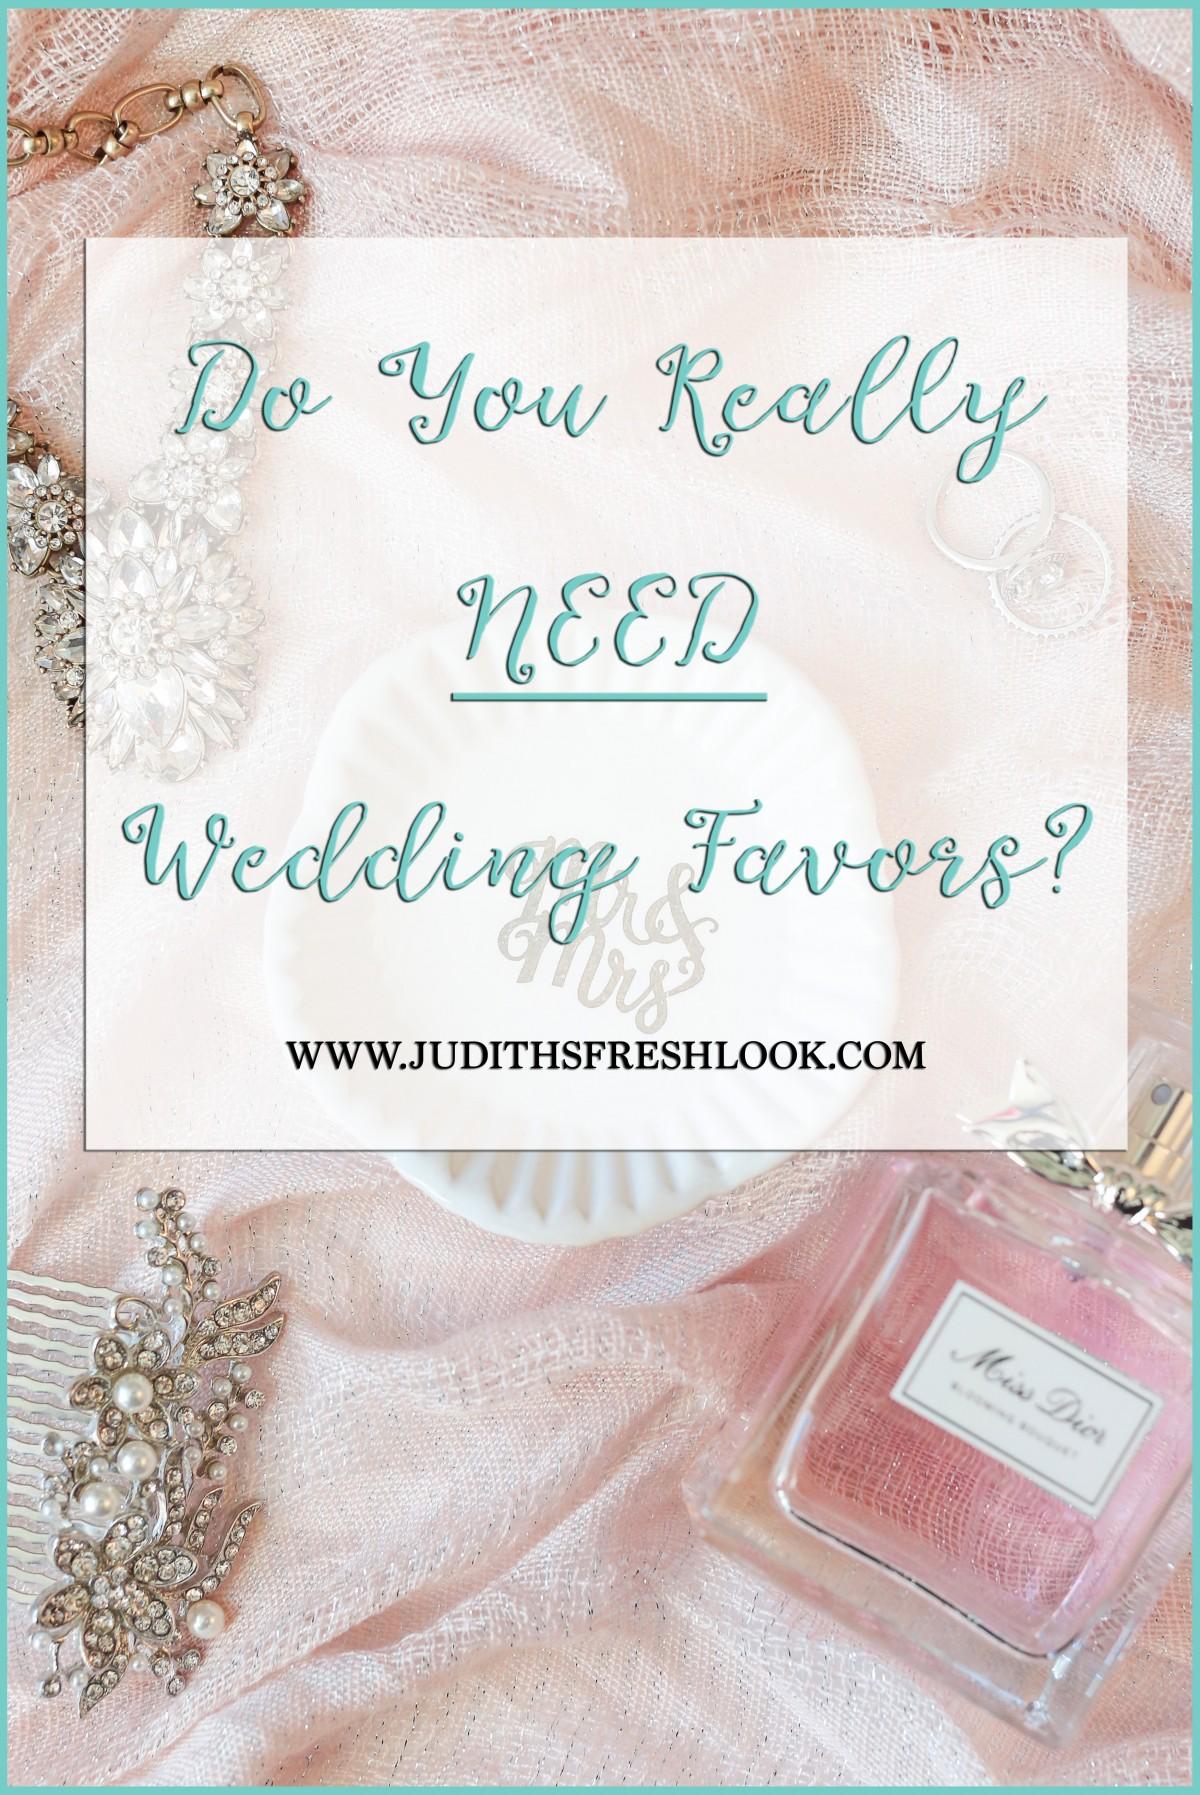 Need Wedding Favors? | Confessions of a Bride - JudithsFreshLook.com